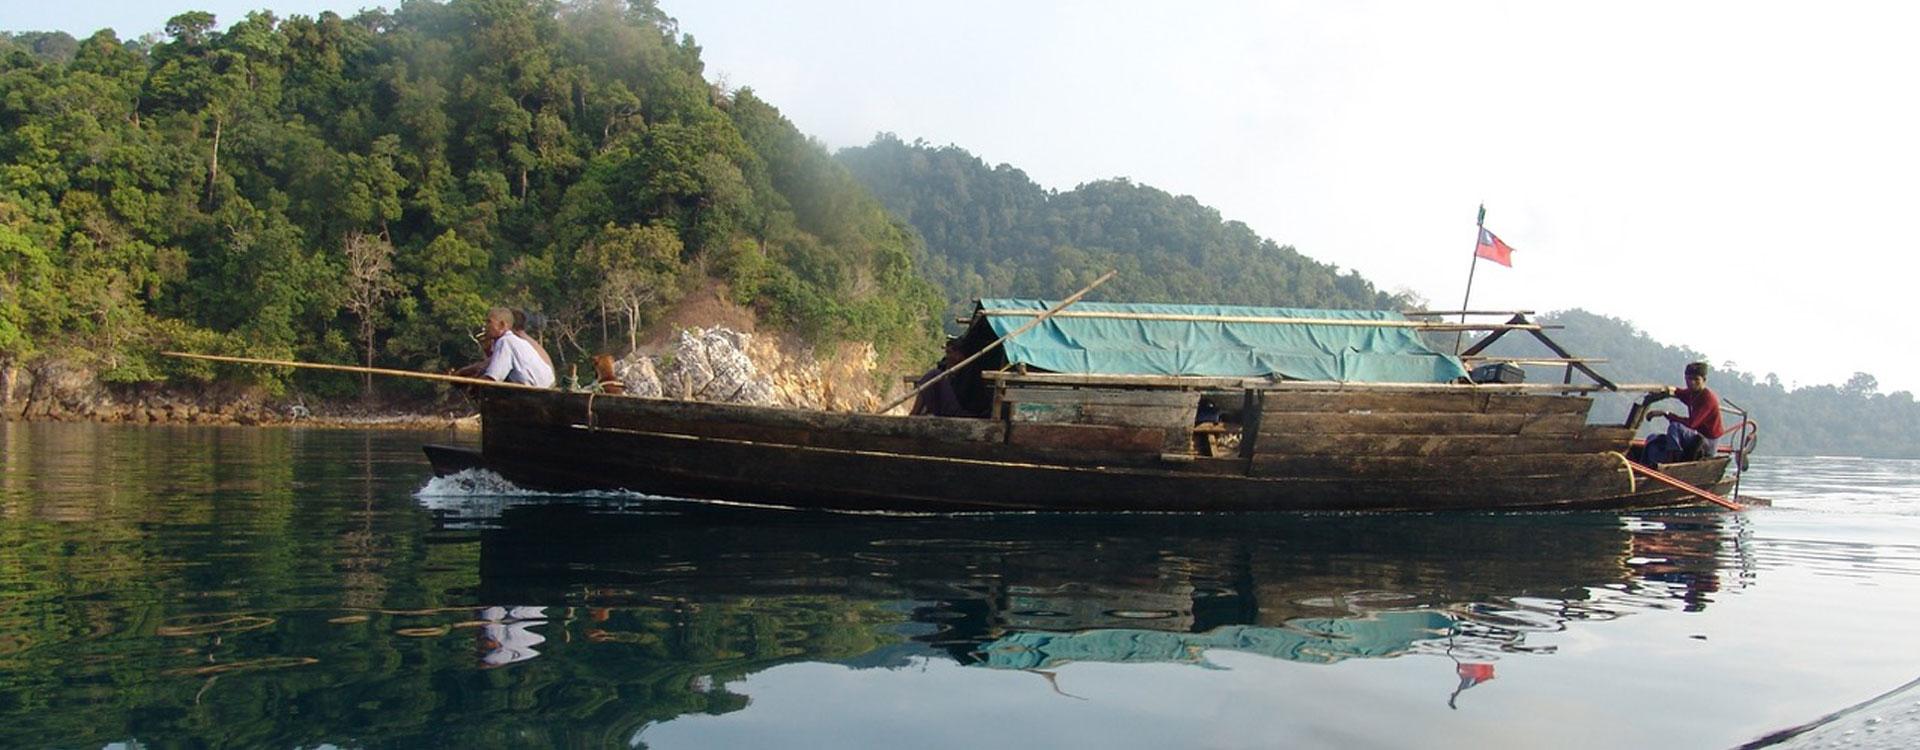 Organic boats